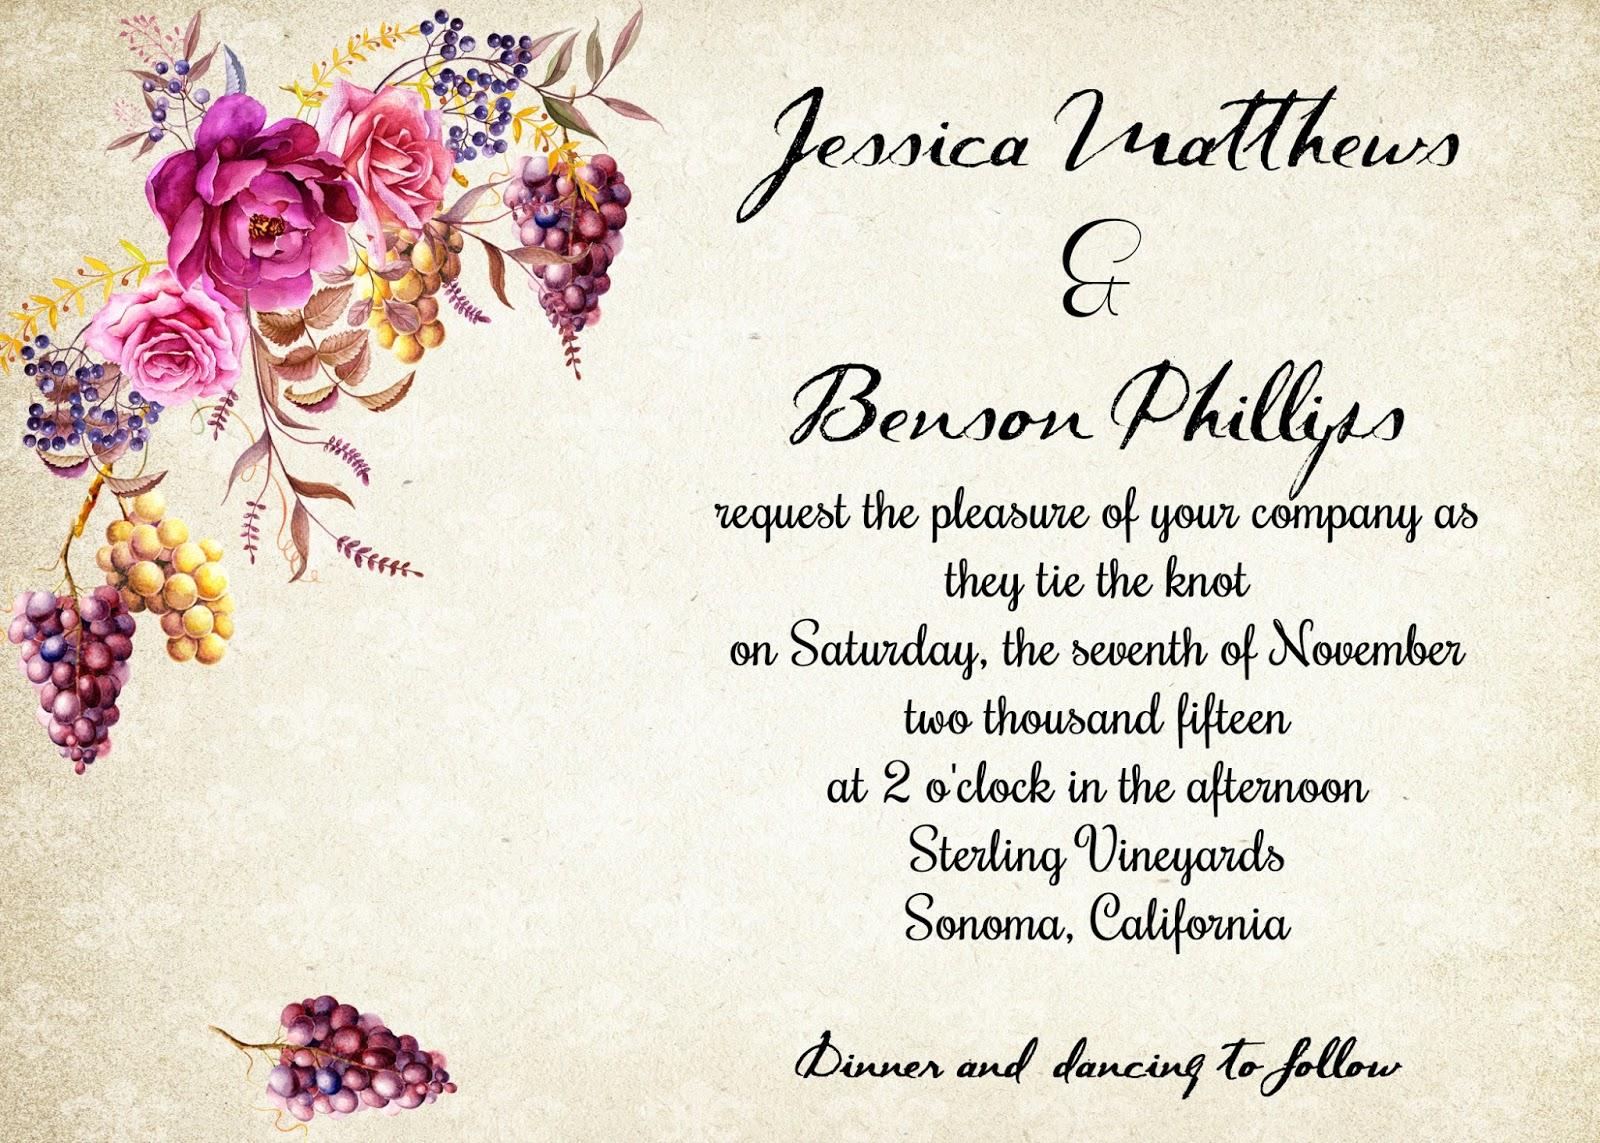 Sugar and Spice Invitations: Vineyard Weddings Ideas